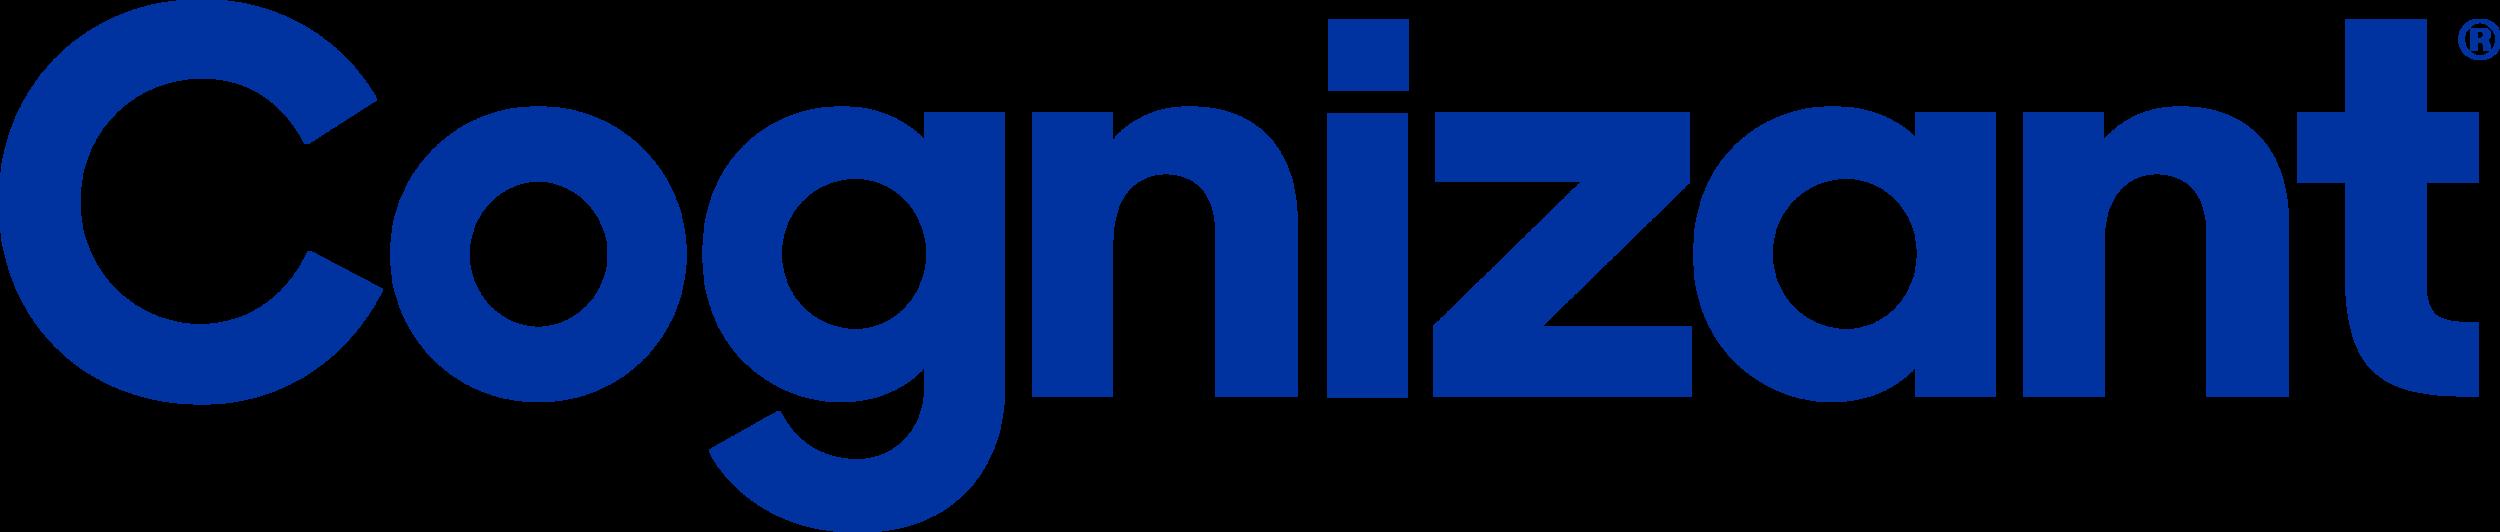 Cognizant_Logo_Brand_Blue.png